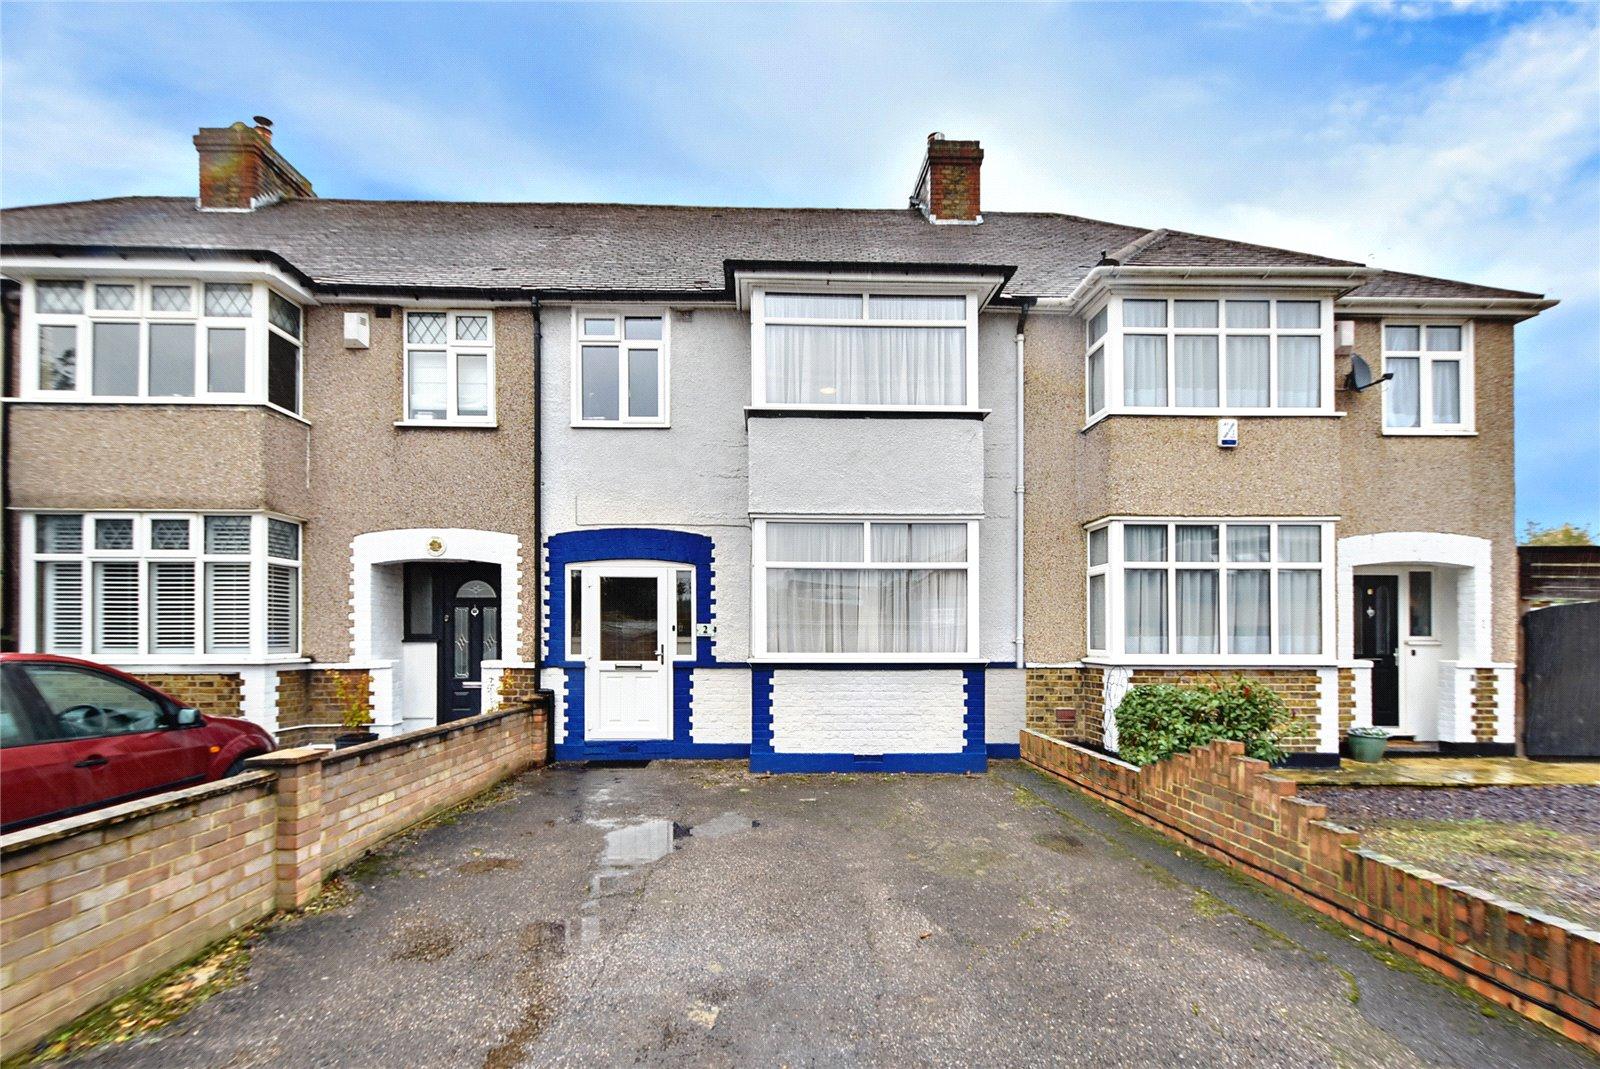 Royston Road, Crayford, Kent, DA1